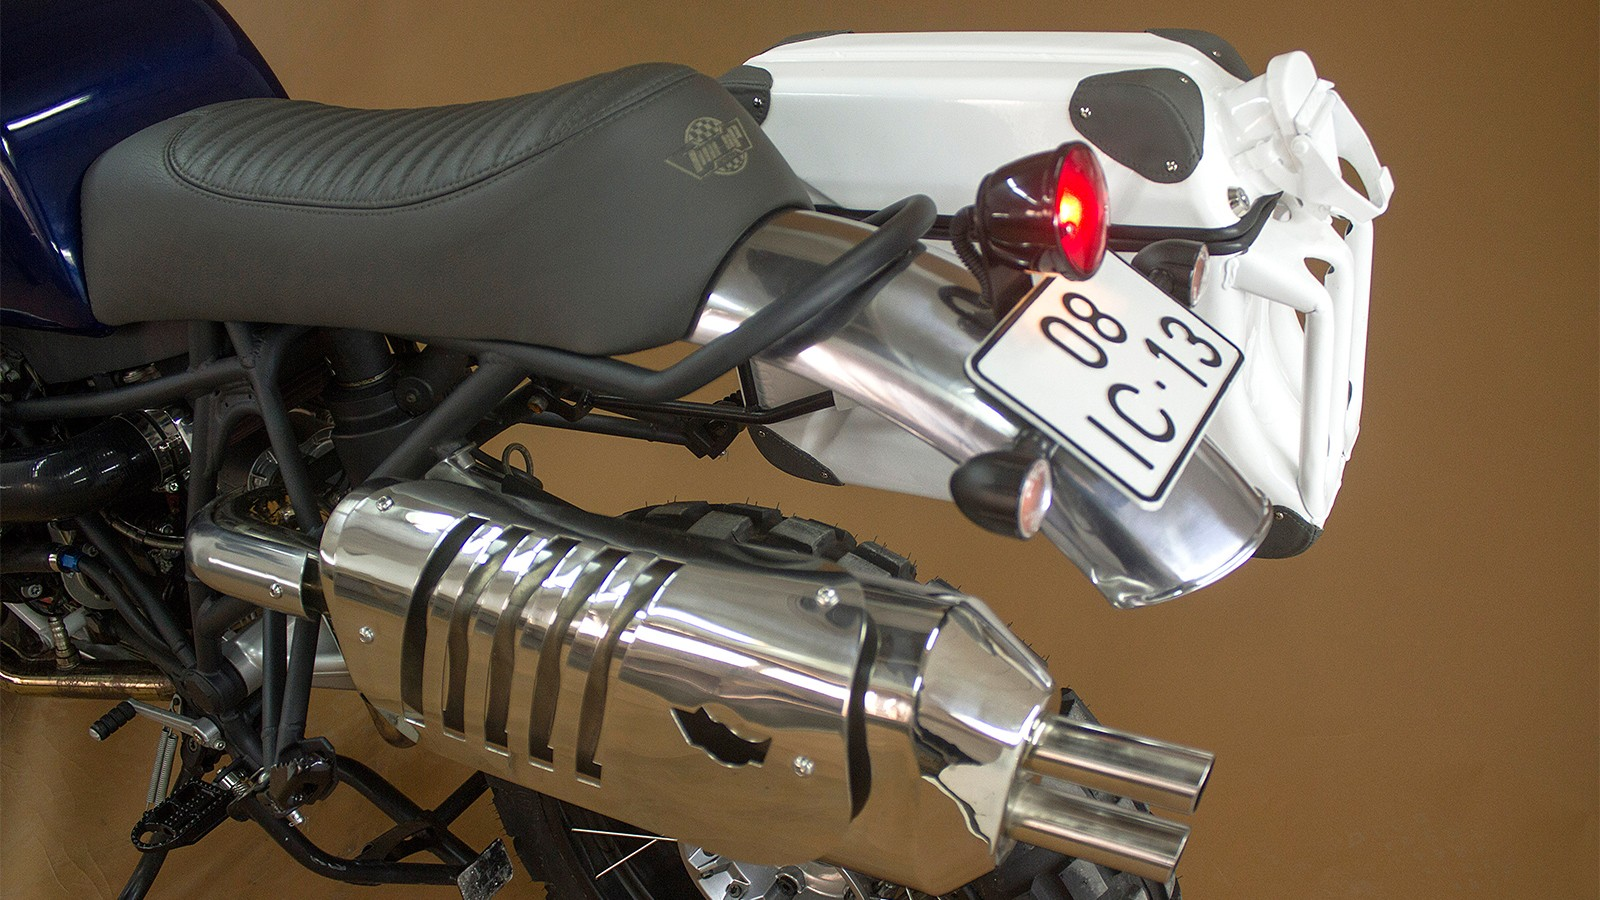 GS HUNTER 1200